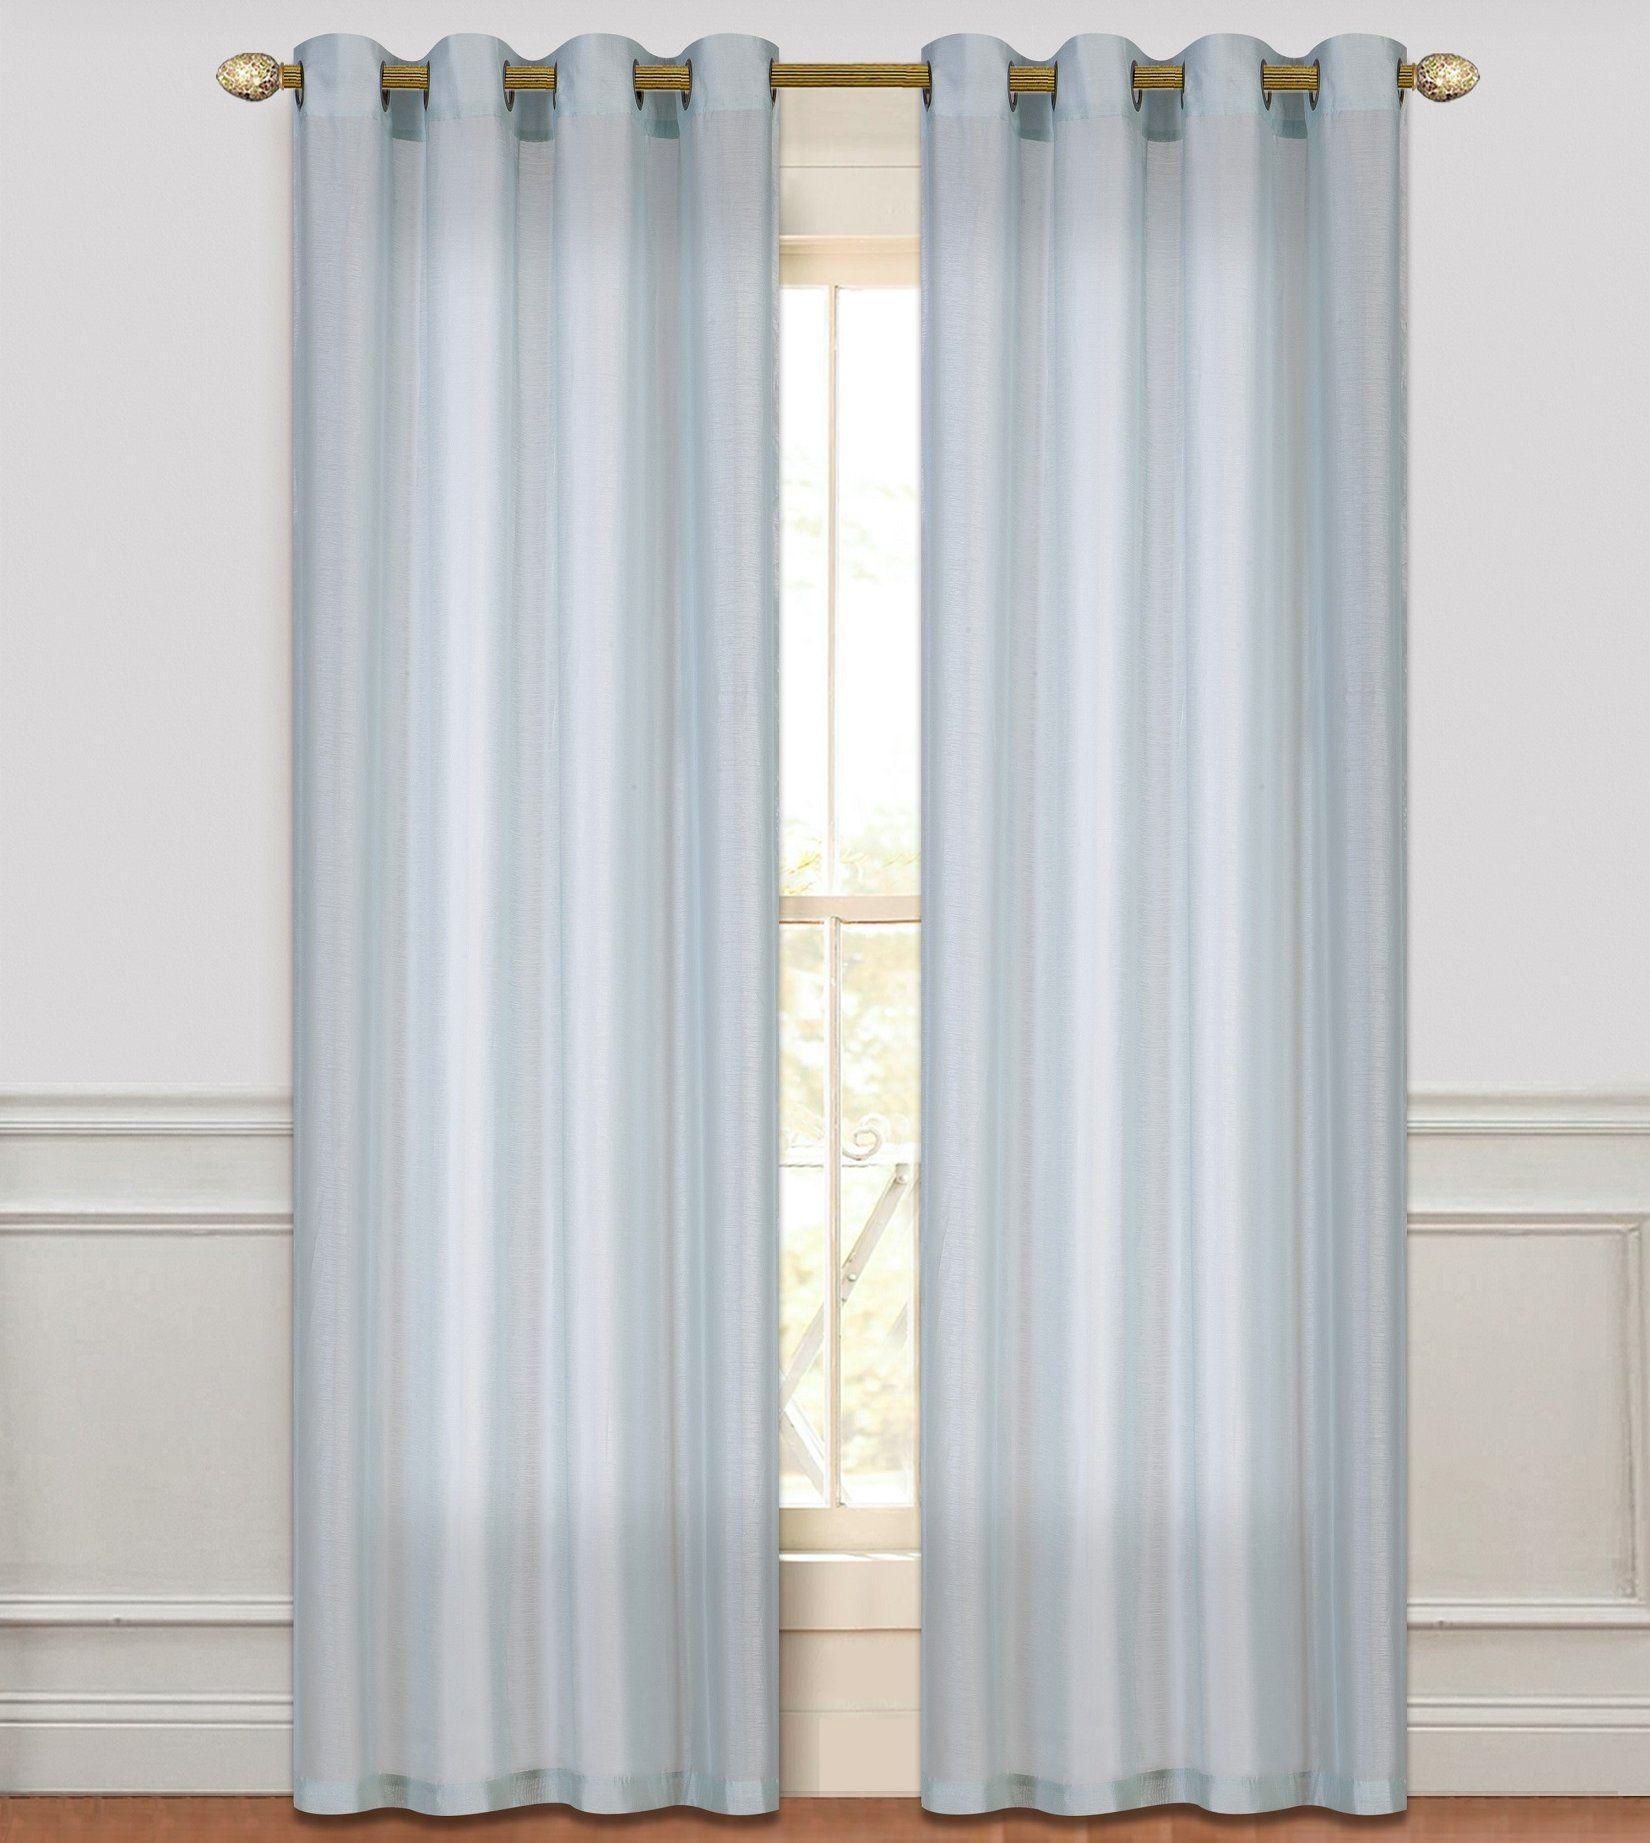 Threshold linen grommet sheer curtain panel product details page - Lara Sheer Grommet Curtain Panel Pair